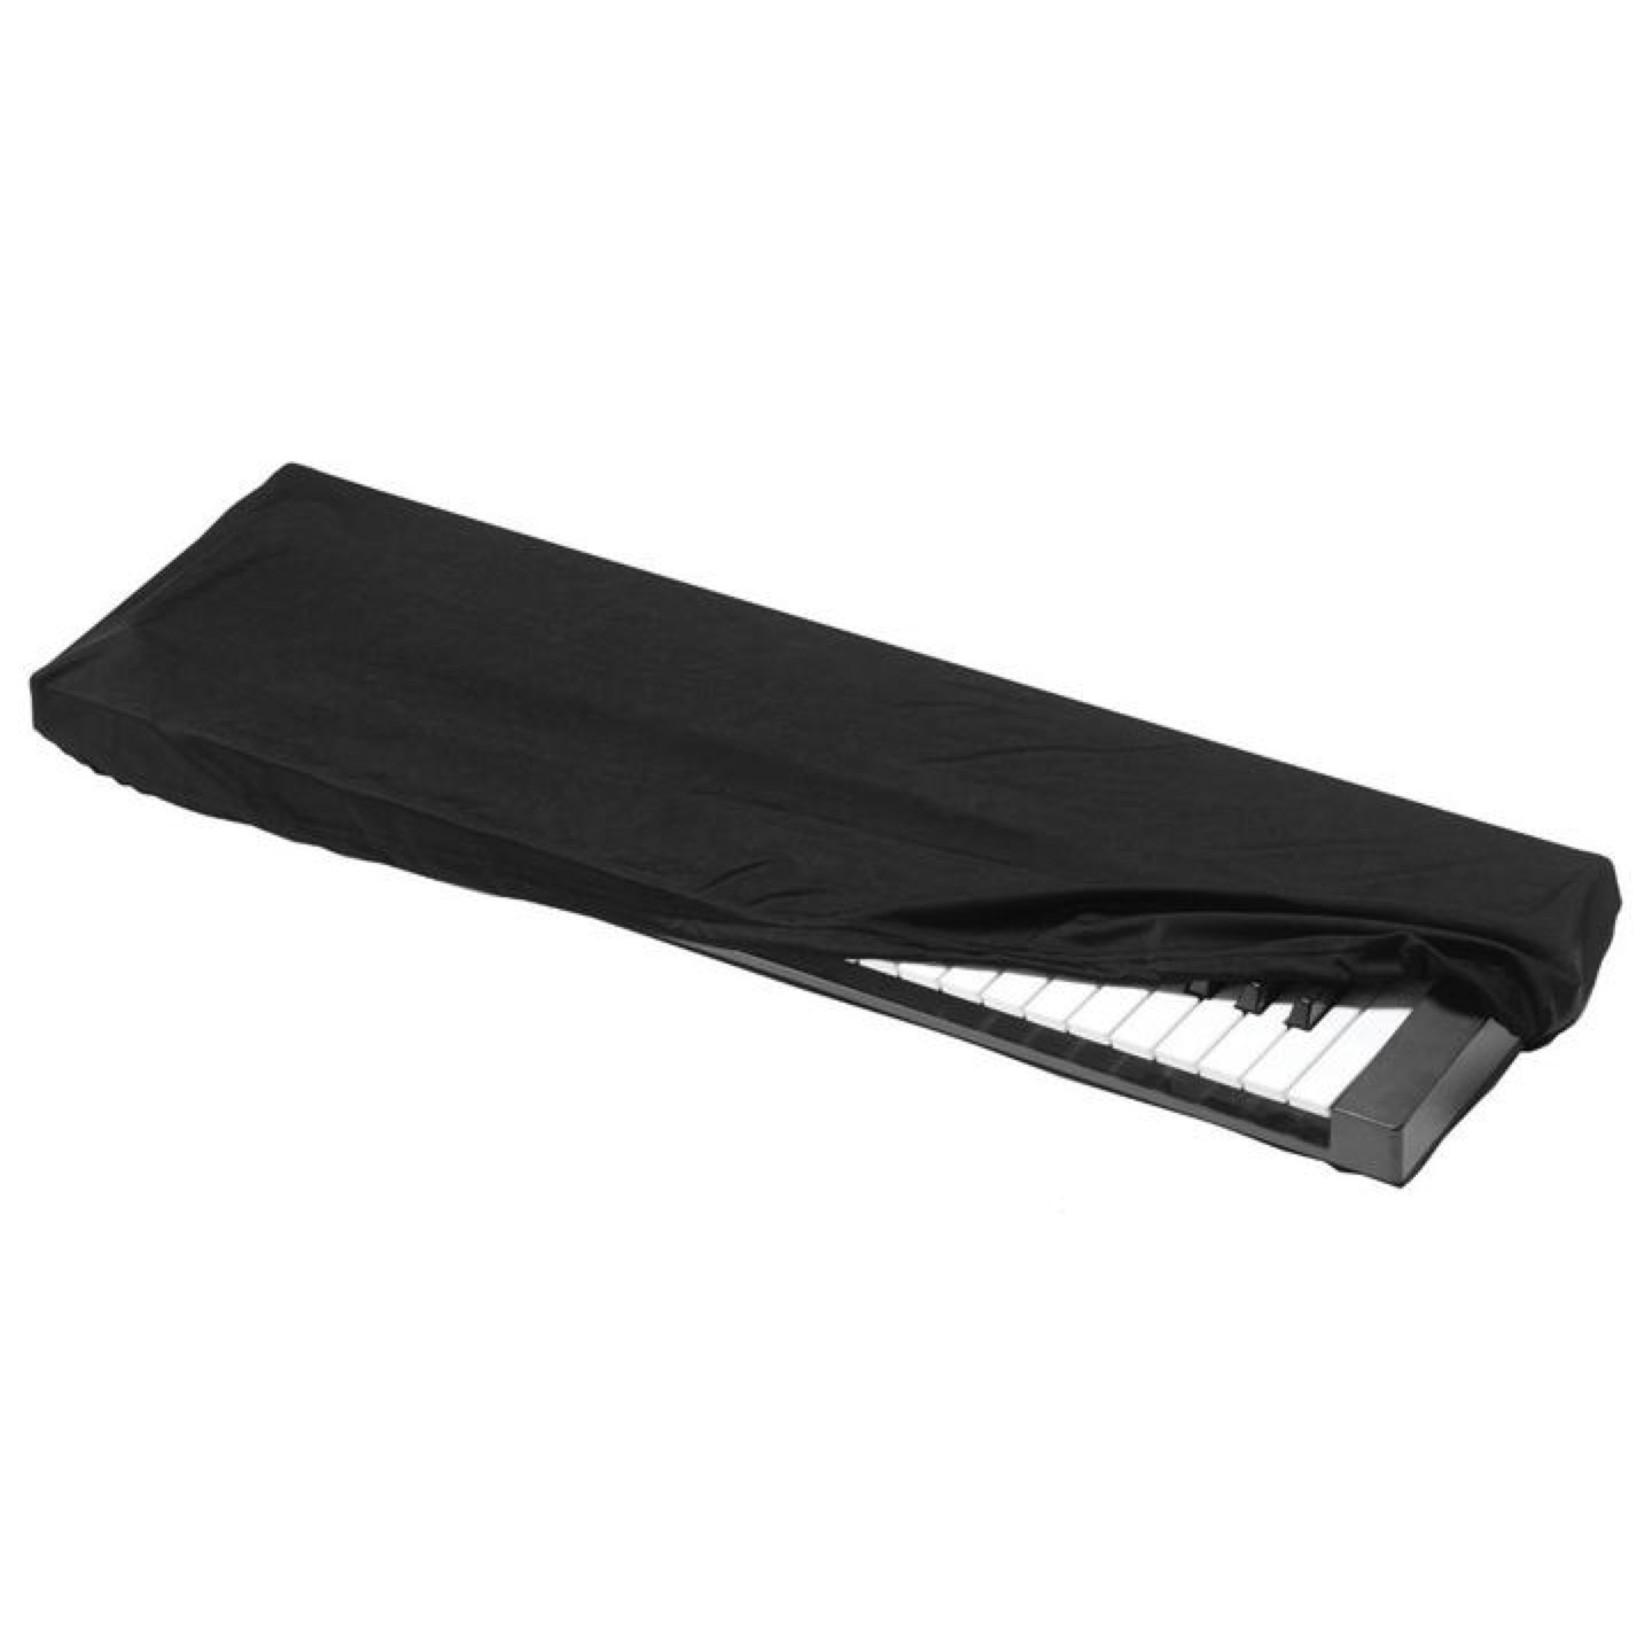 Kaces Kaces KKC-LG Stretchy Keyboard Dust Cover - Large Black (for 76- and 88-key keyboards)